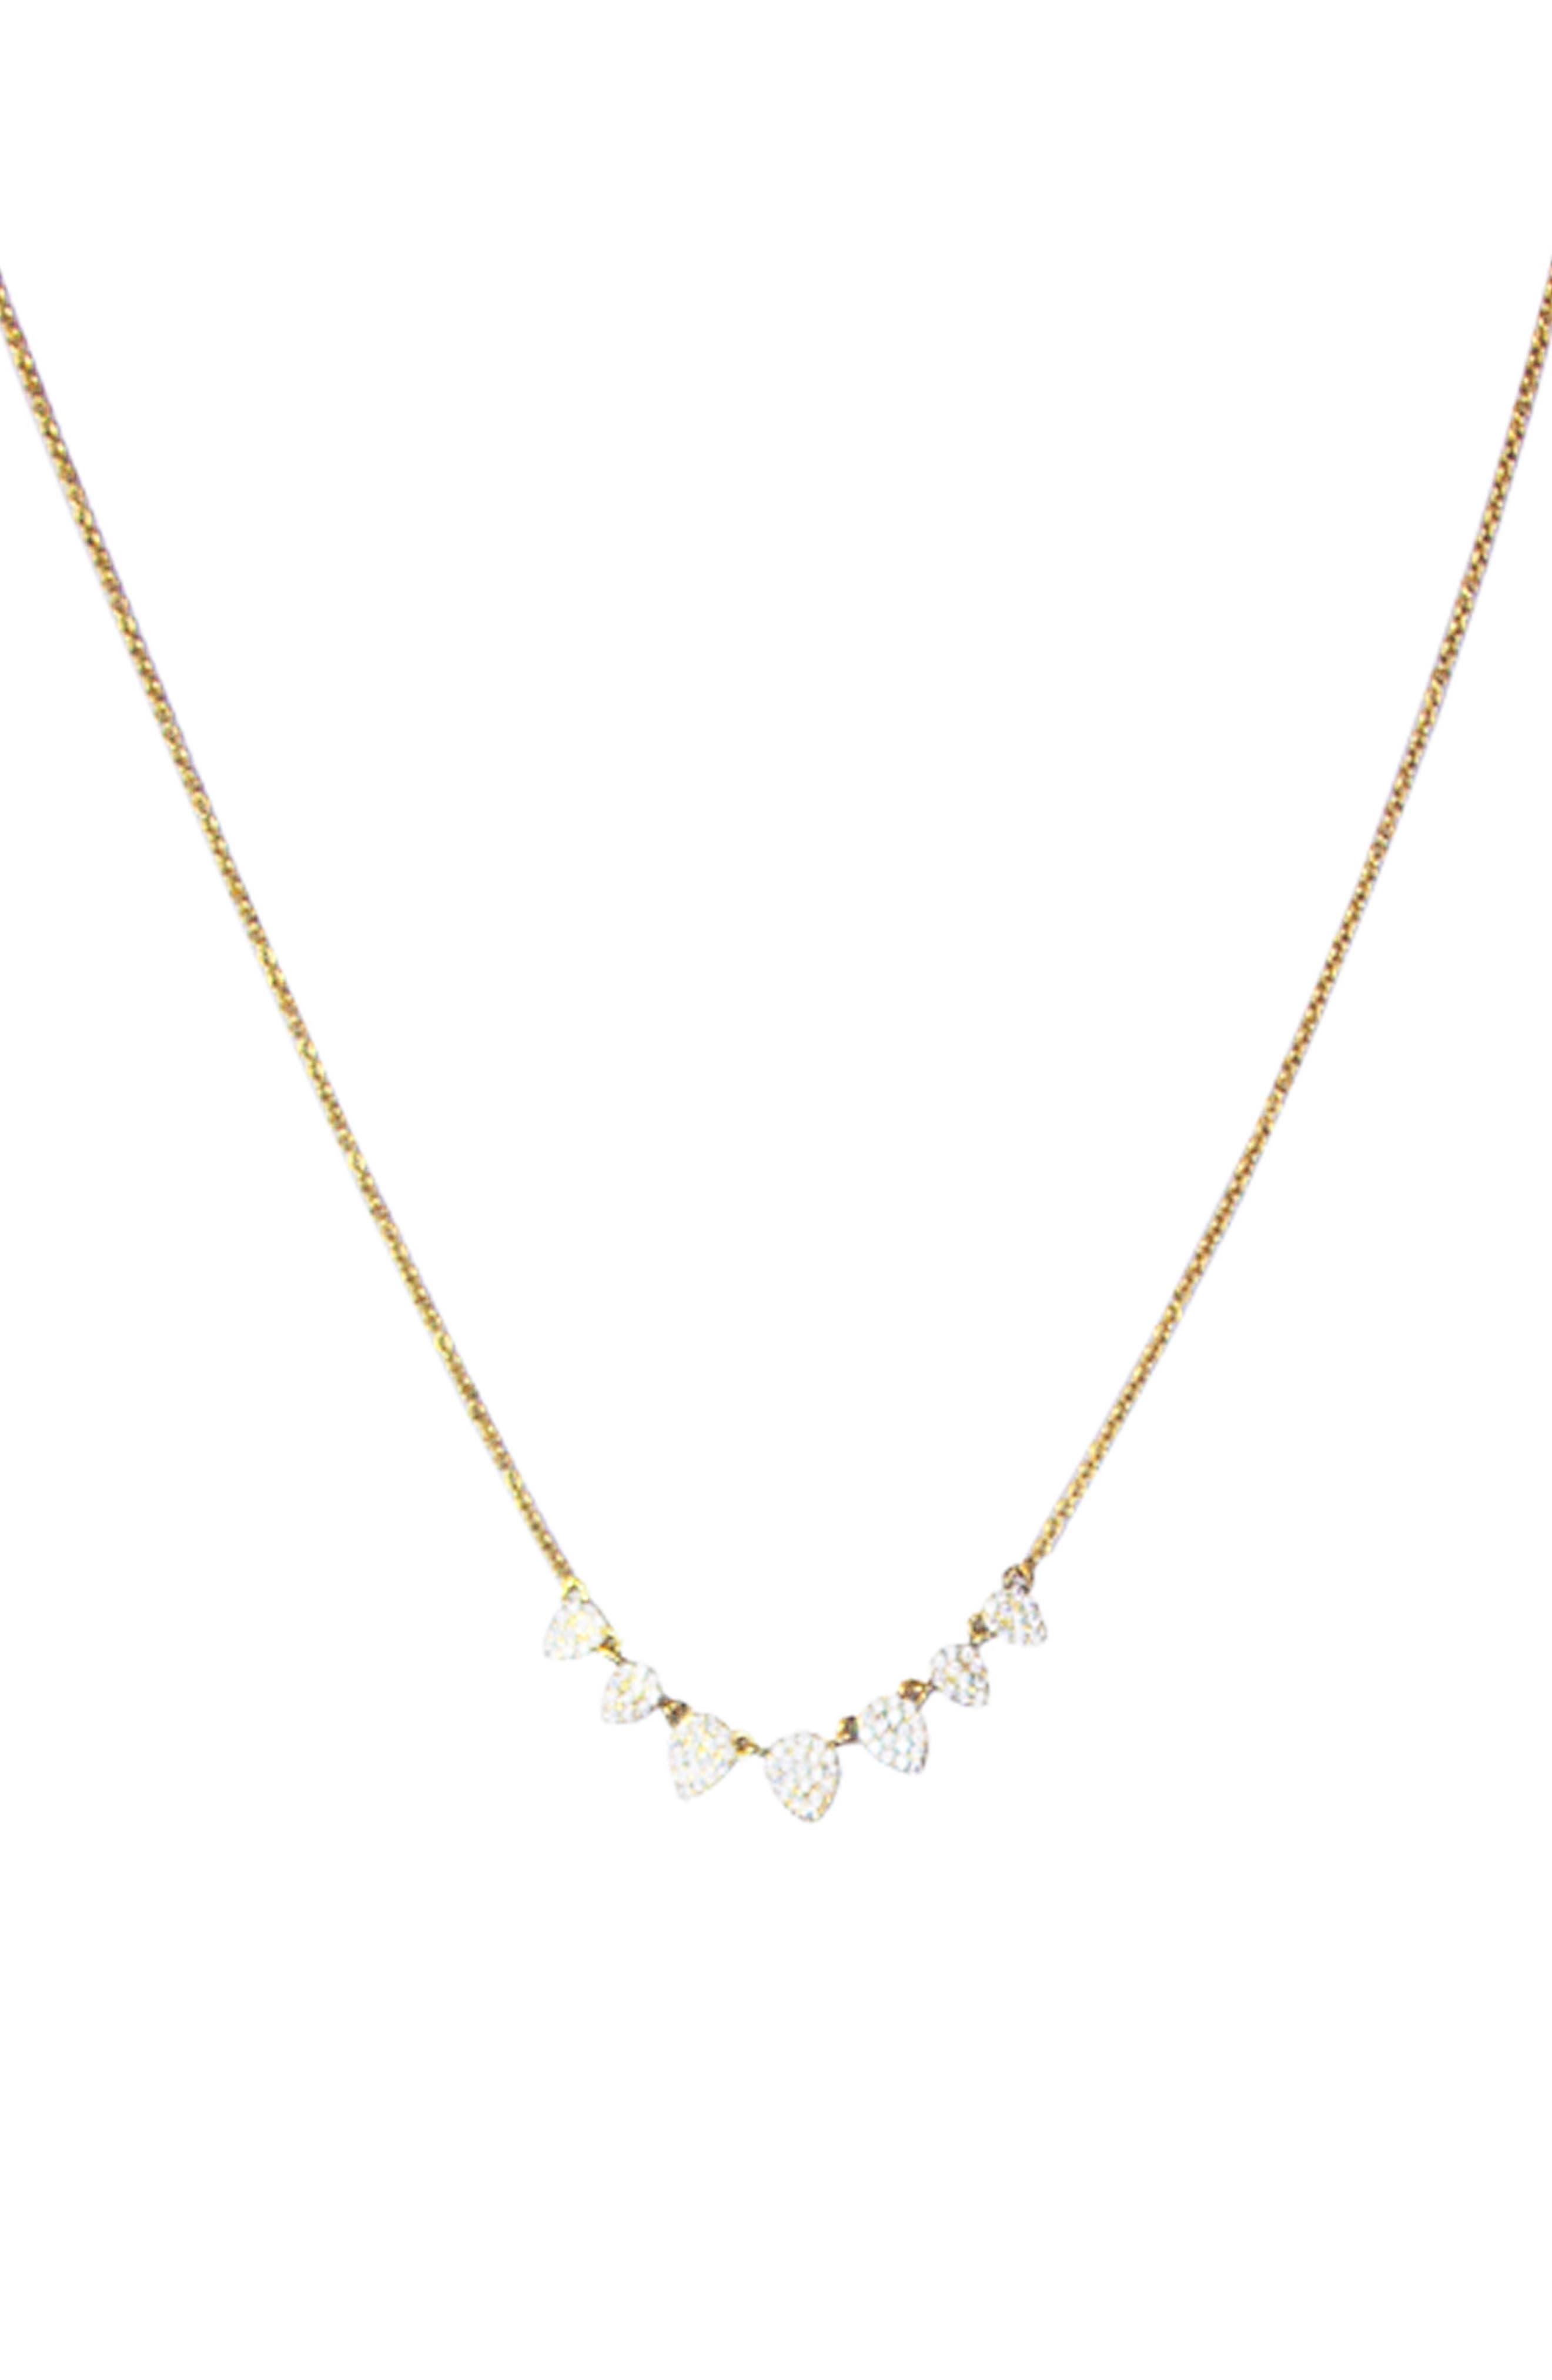 Main Image - Jules Smith Cubic Zirconia Pavé Necklace